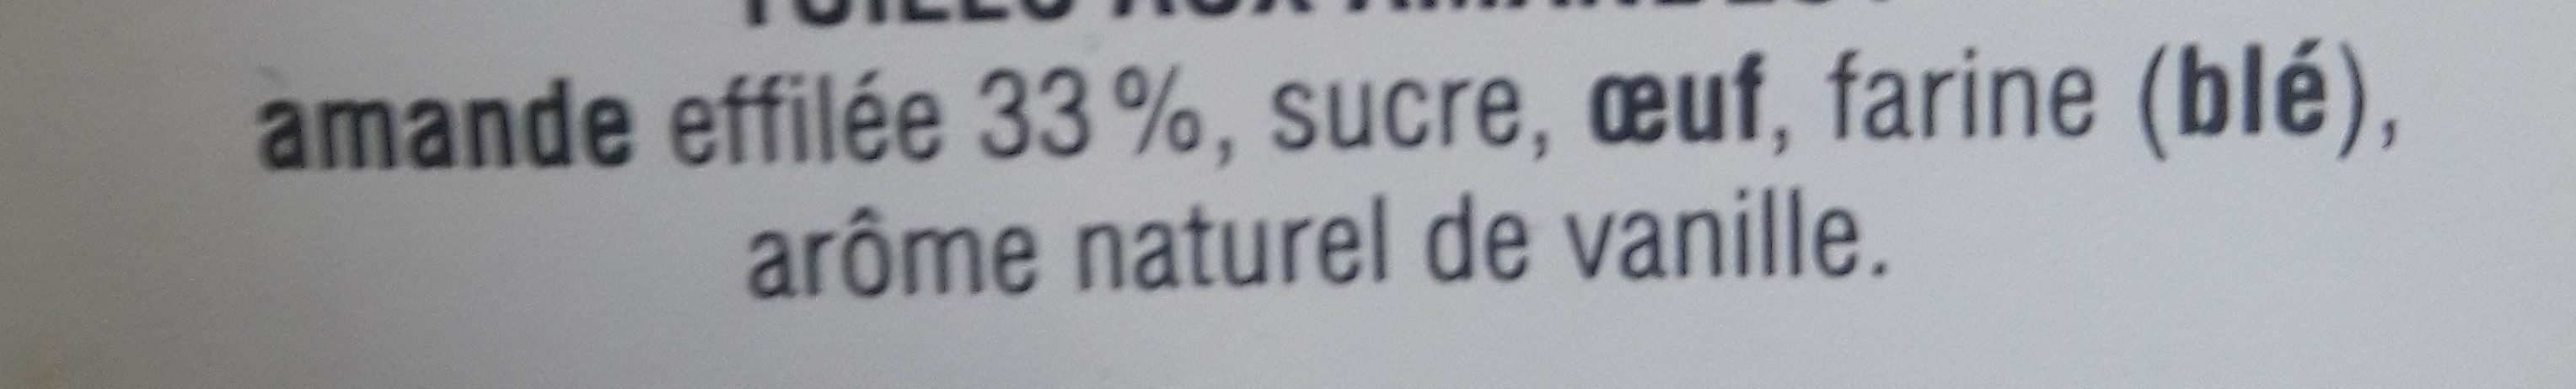 Tuiles aux amandes - Ingredients - fr